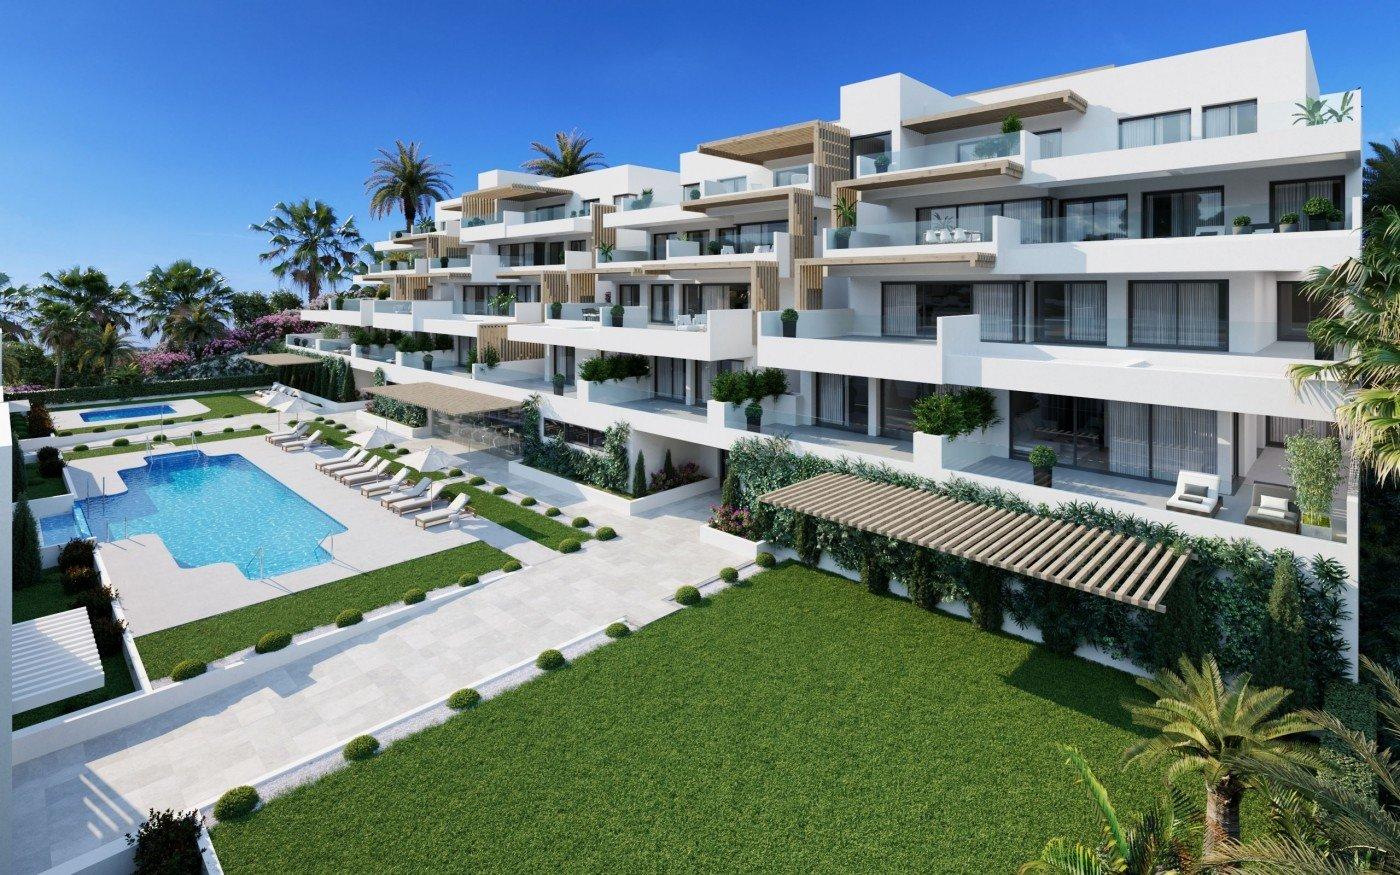 Apartment for sale in Estepona, Estepona Town